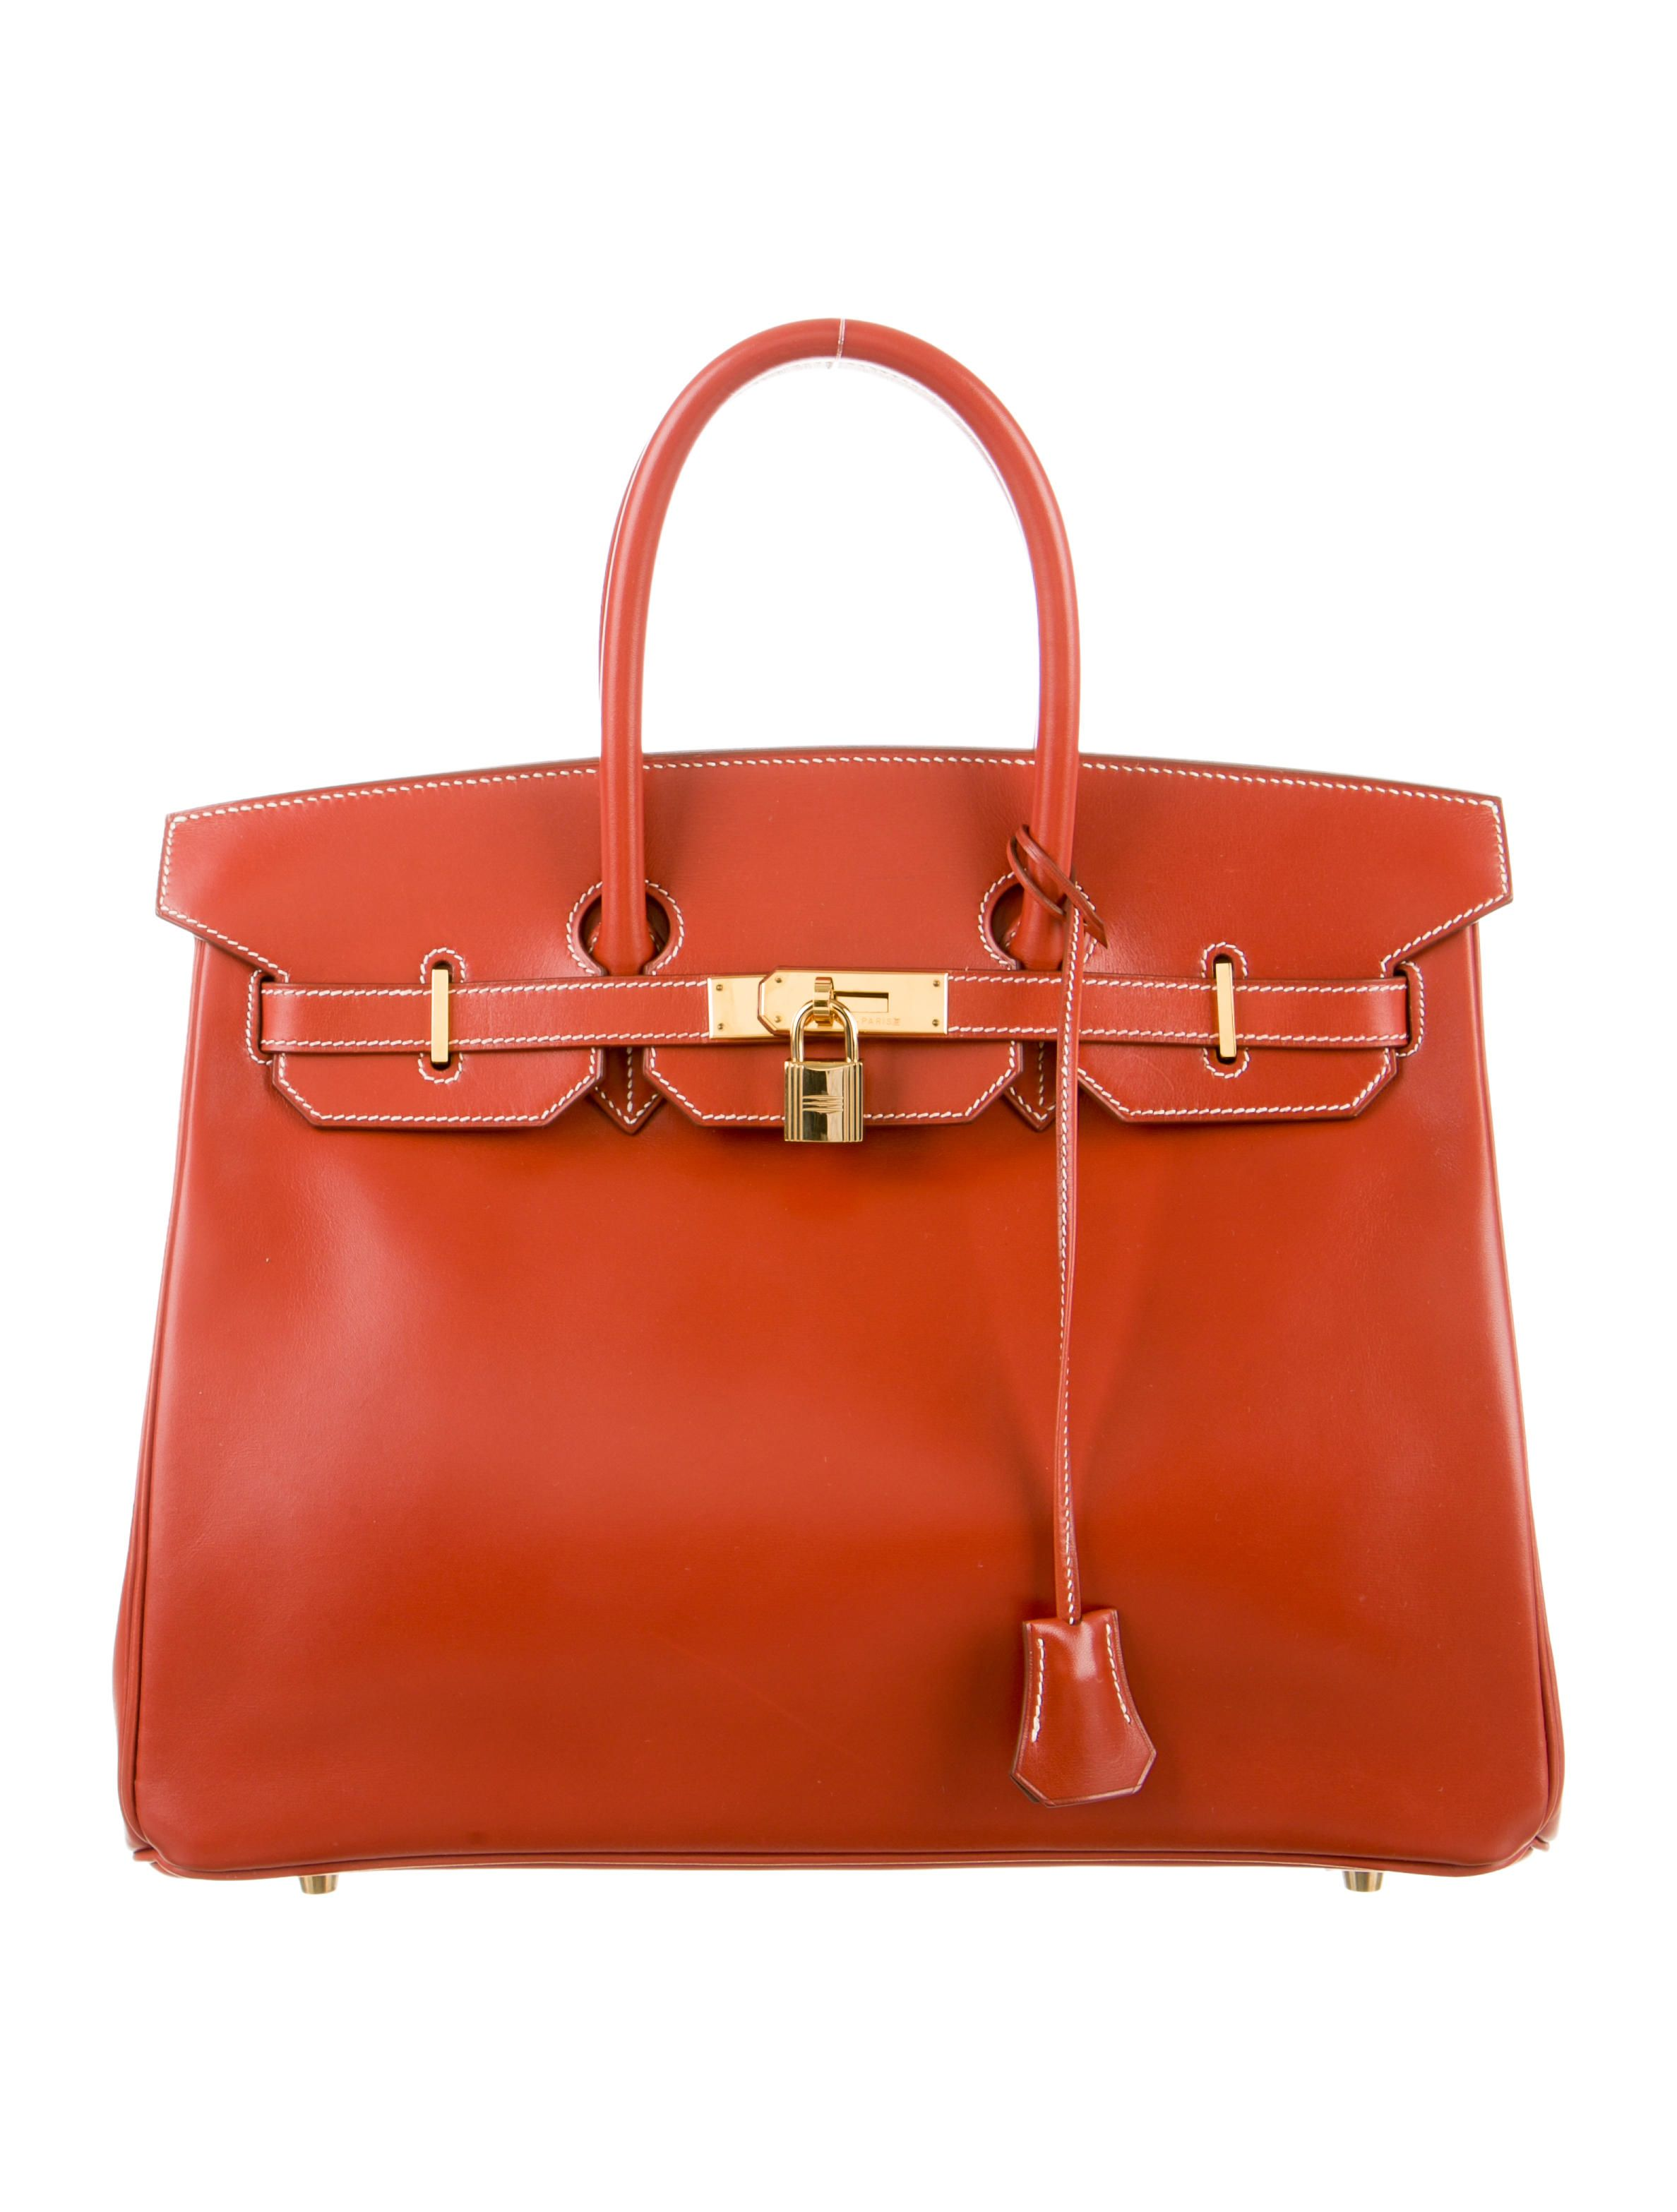 Hermes Rouge Pivoine Kelly 28cm handbag  9a6fa8fc61402